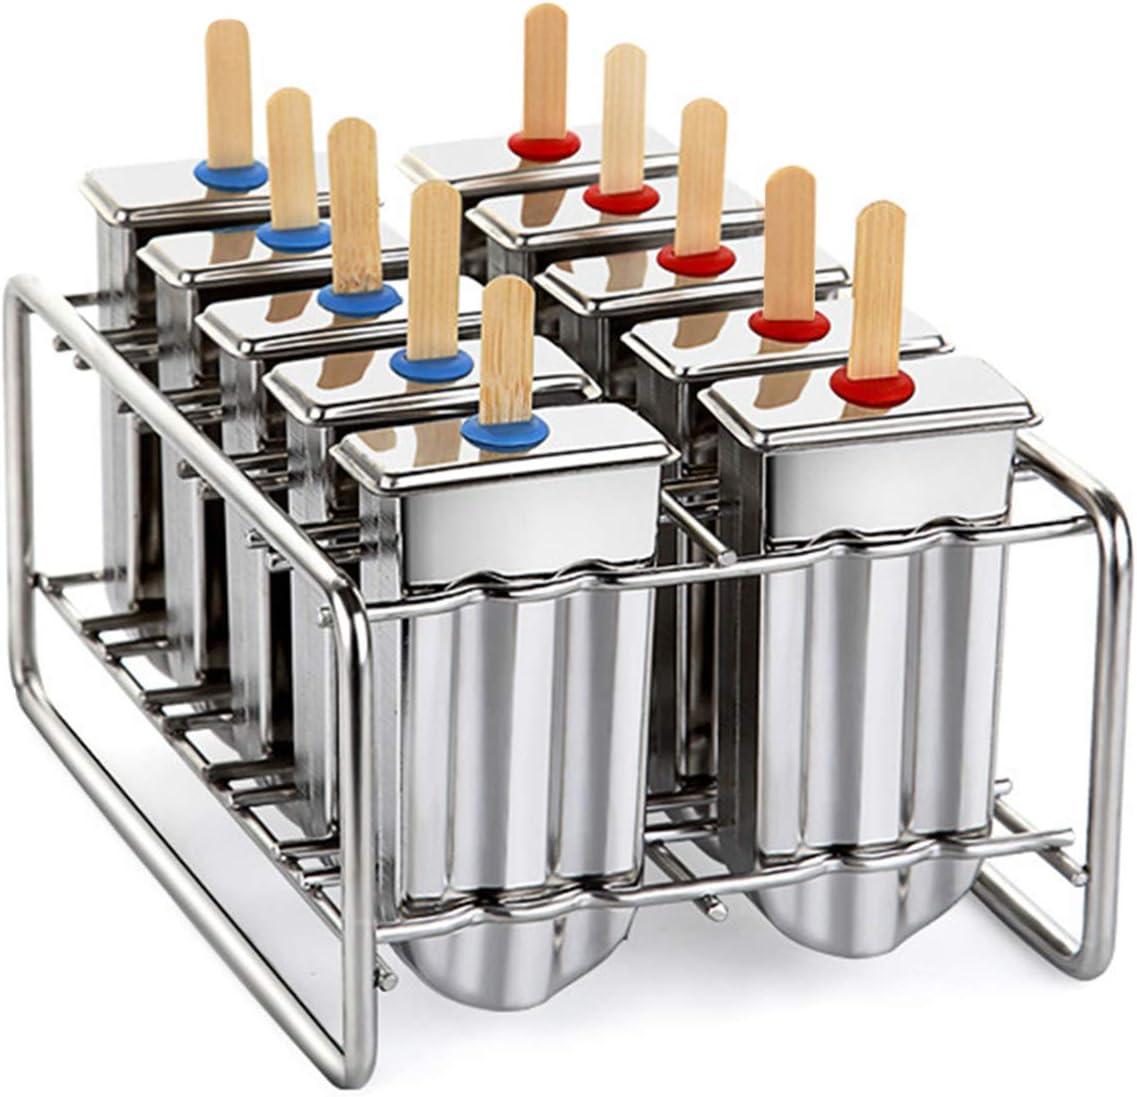 10 Molds Stainless Steel Popsicle Ice Cream Stick Holder Mold 100Pcs Sticks US